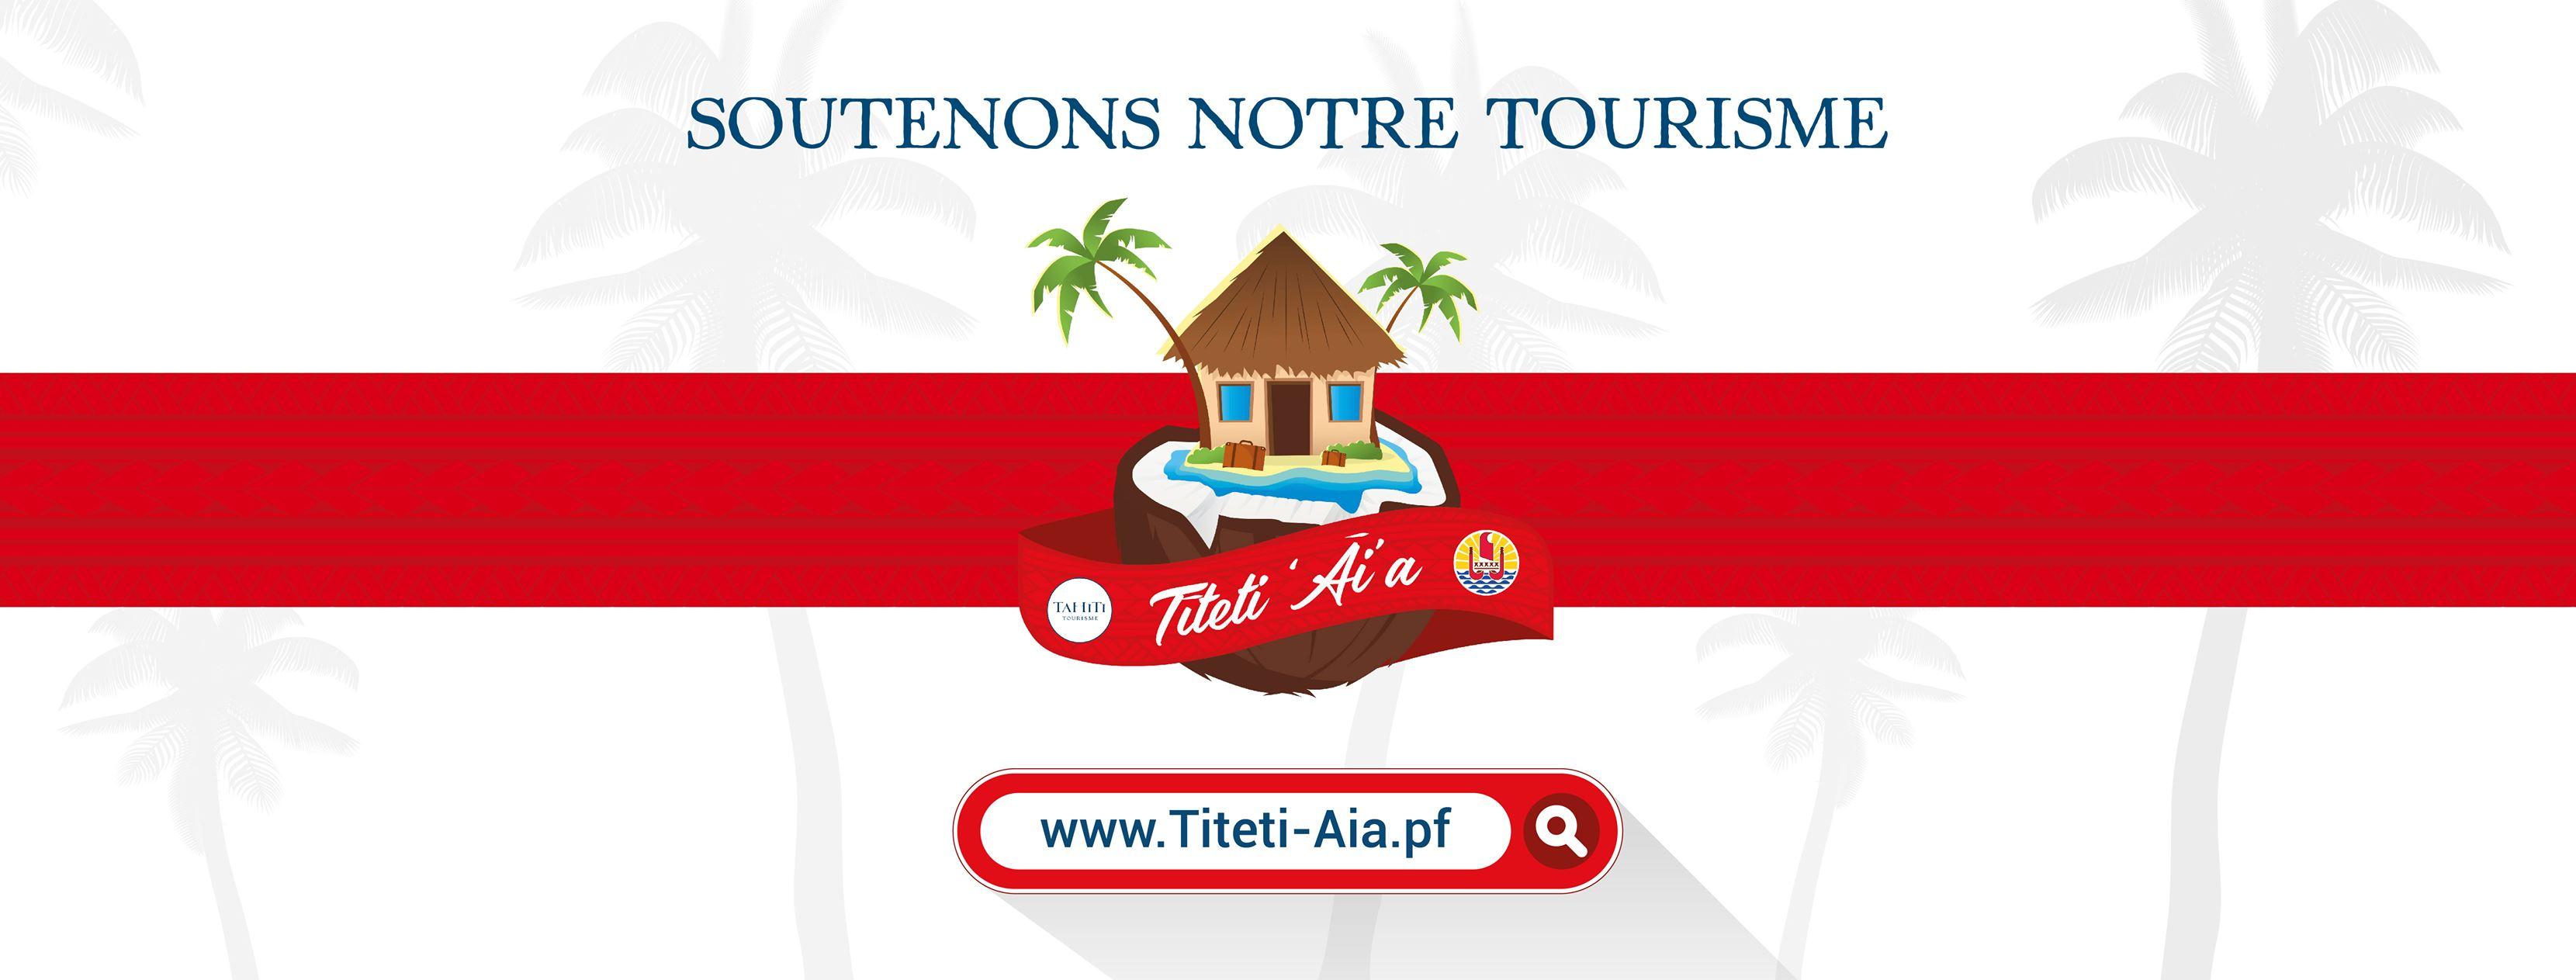 https://tahititourisme.fr/wp-content/uploads/2017/08/tahititourismephotodecouverture1140x550.jpg